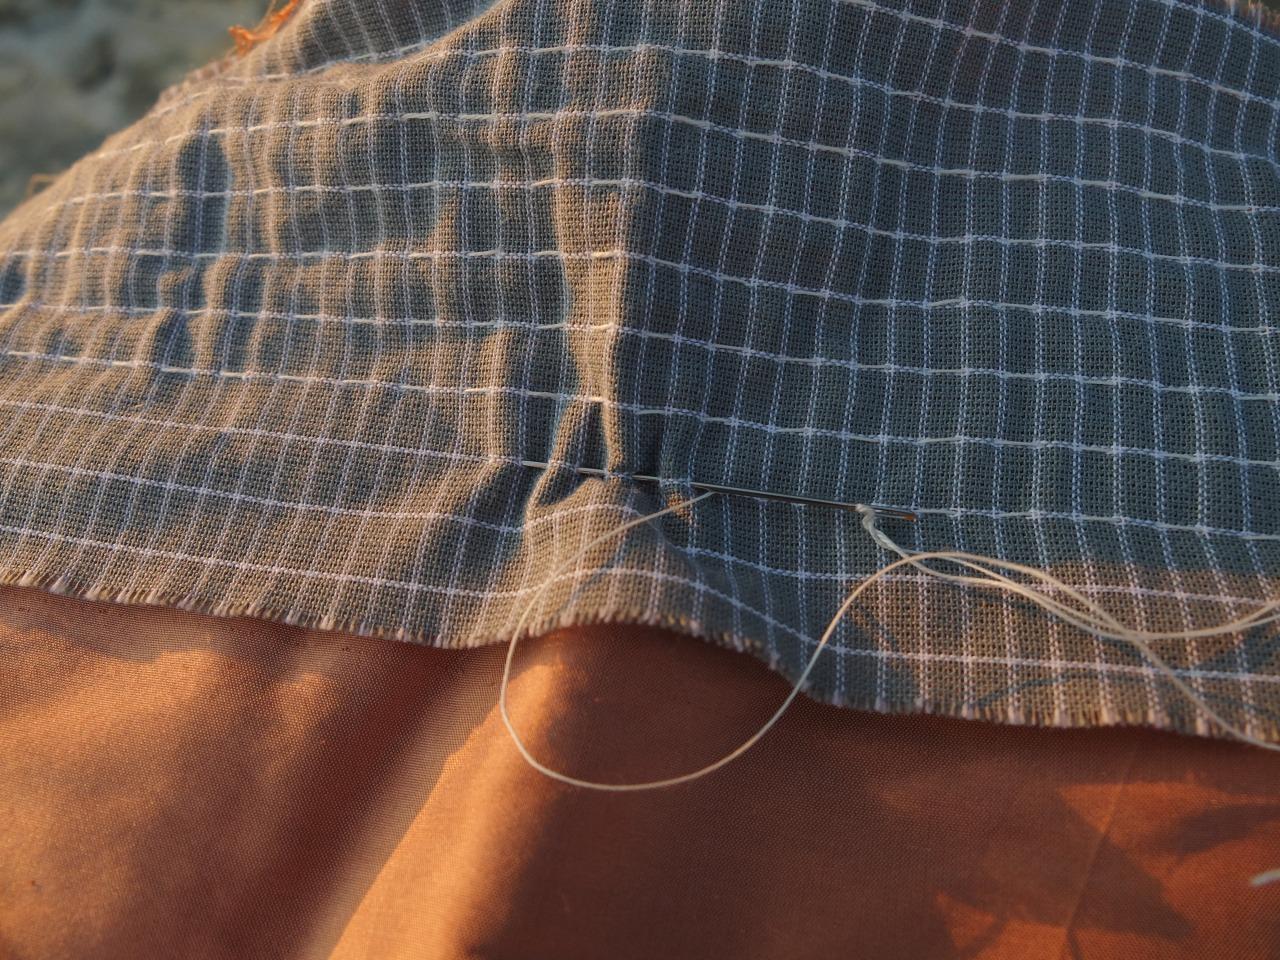 mangia minga - Sewing a Dirndl: Stifteln